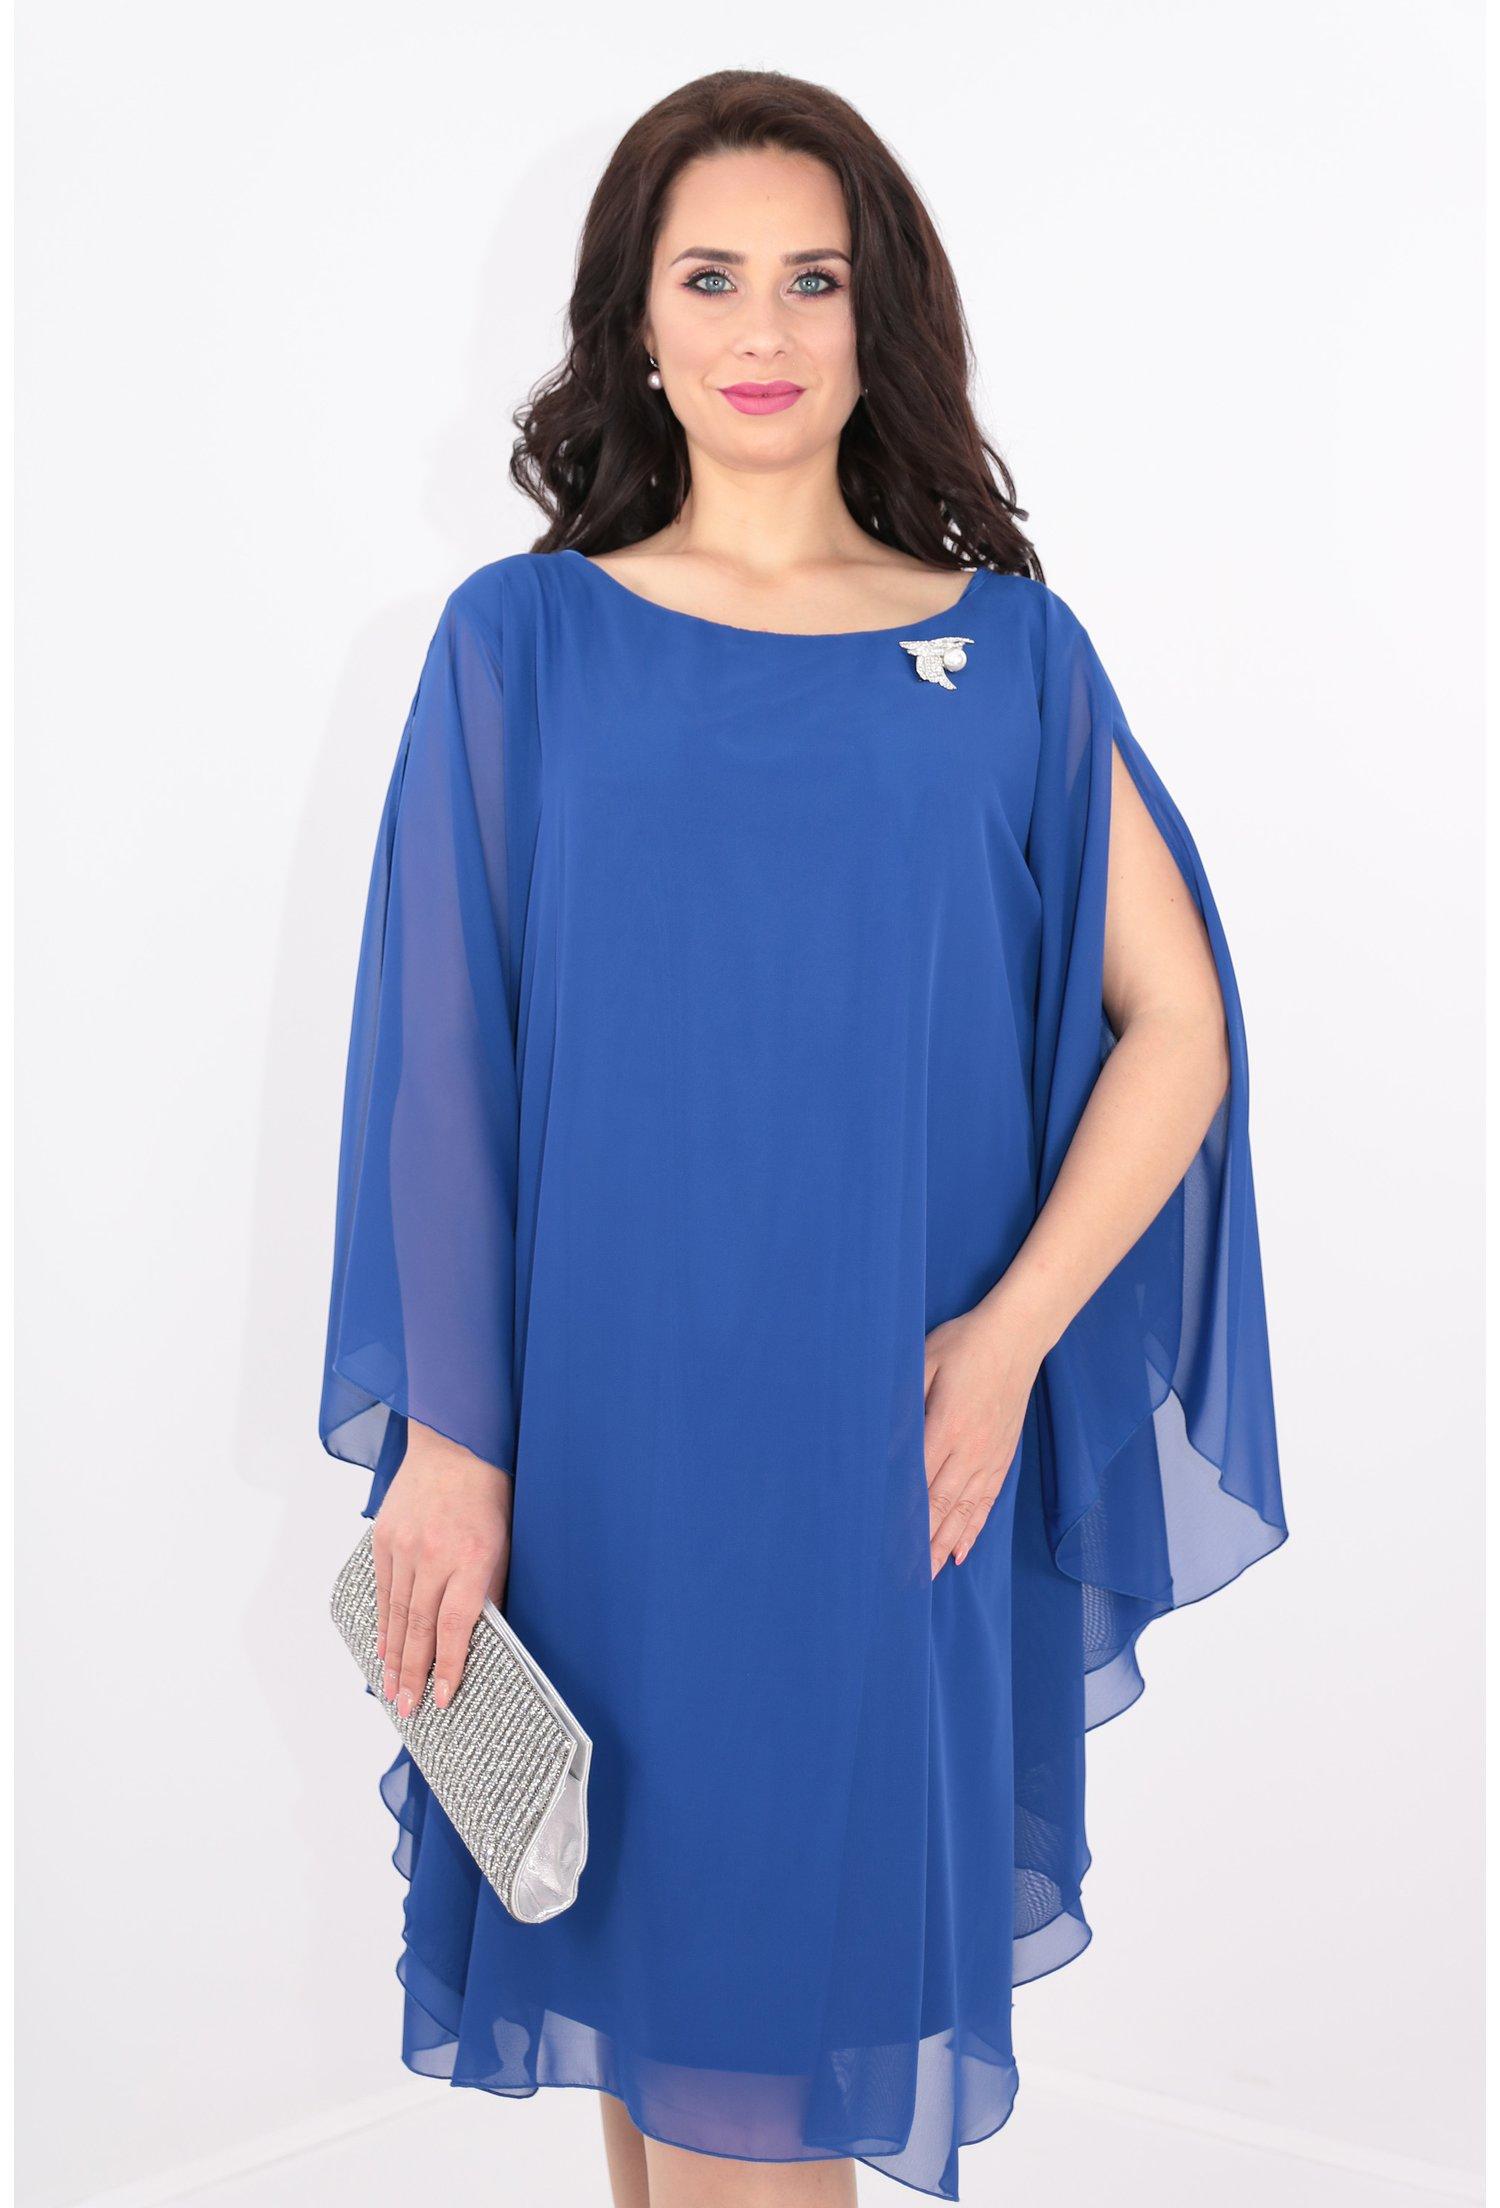 Rochie vaporoasa din voal albastru